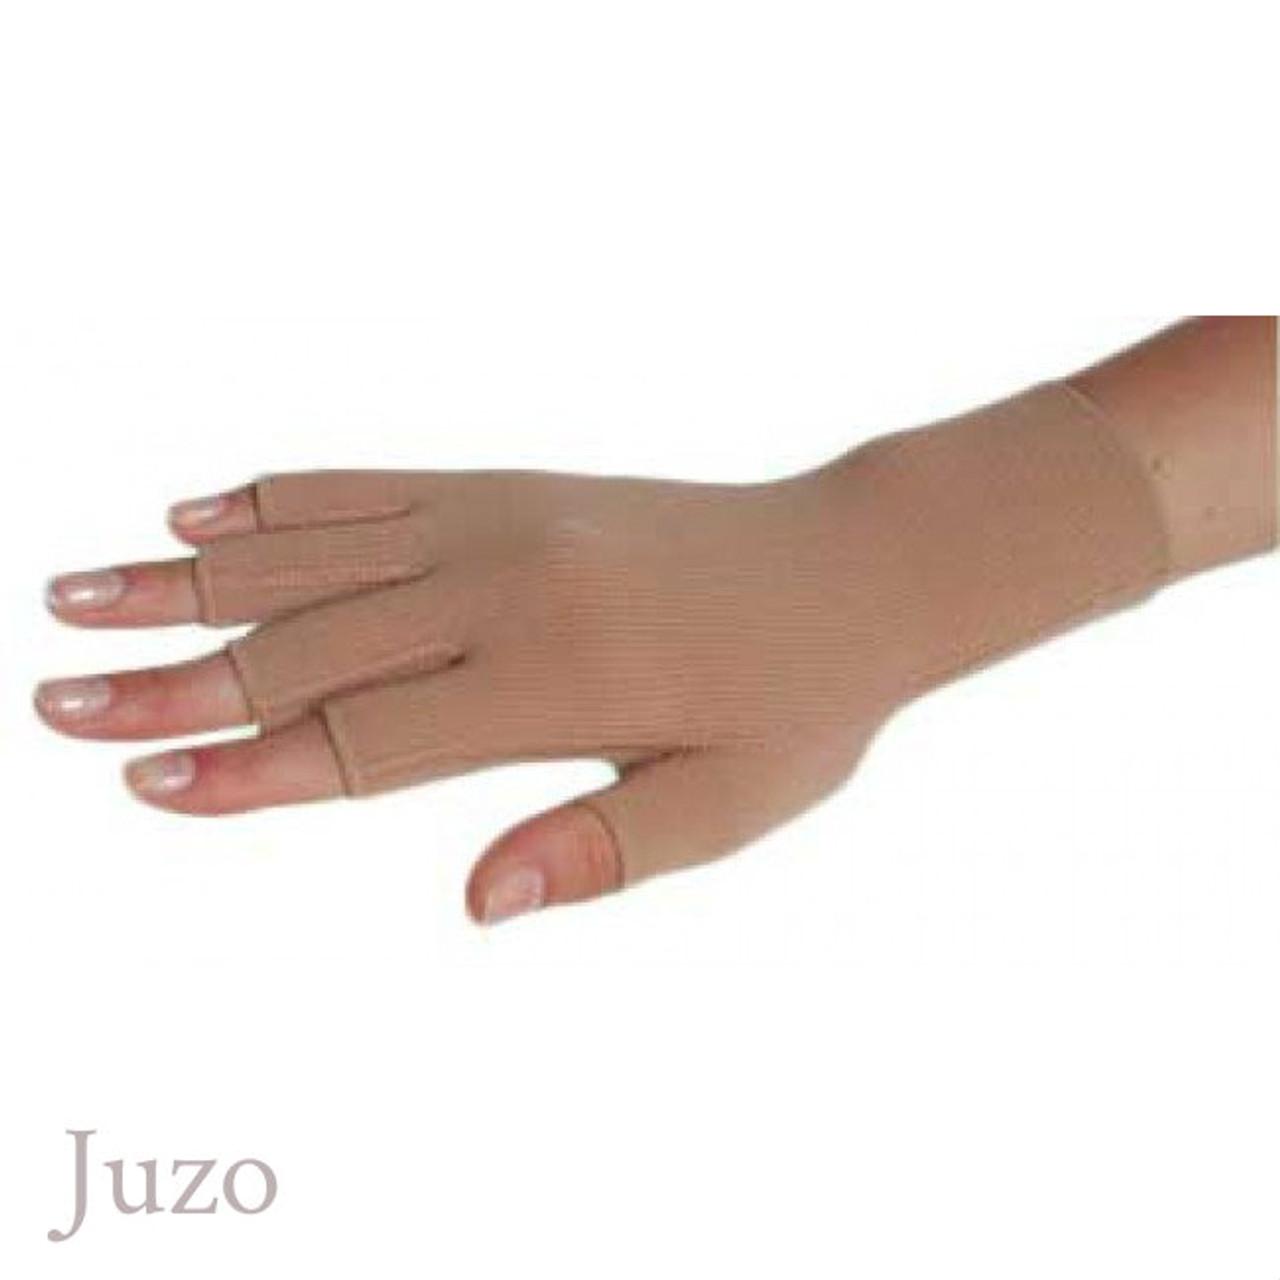 3114fcf65d4809 Juzo Expert Compression Glove - SerraNova